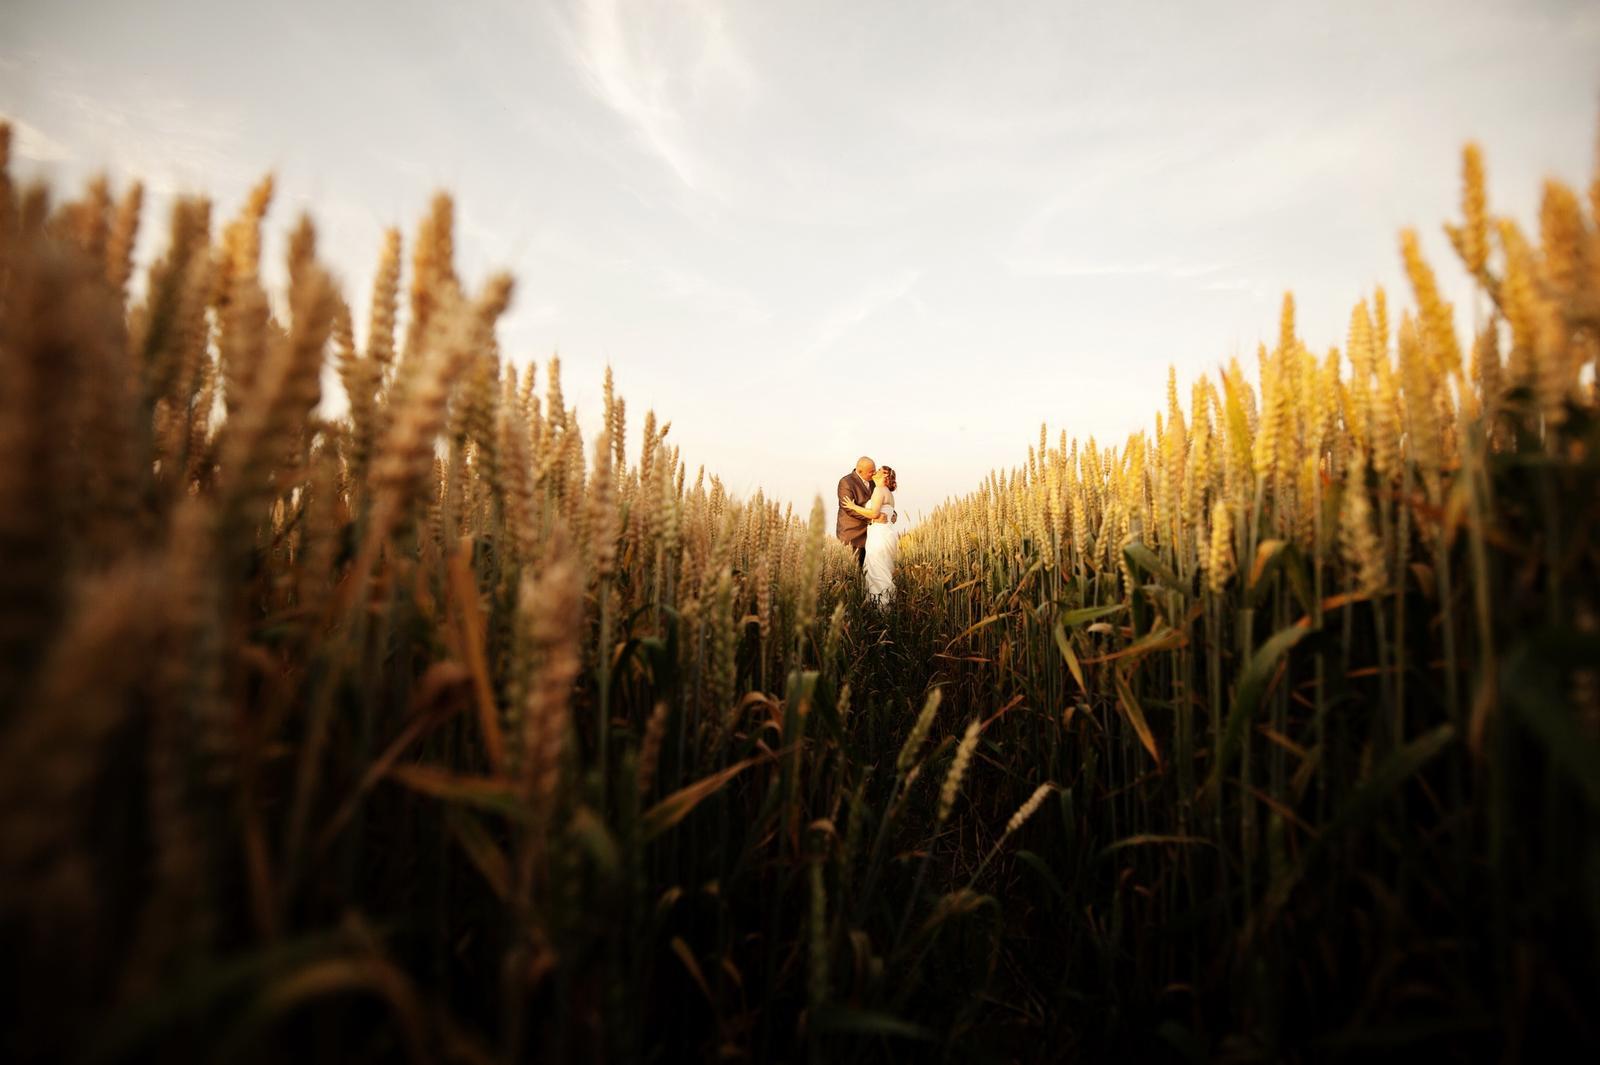 @lucikvesela Pred výberom fotografa... - Obrázok č. 1